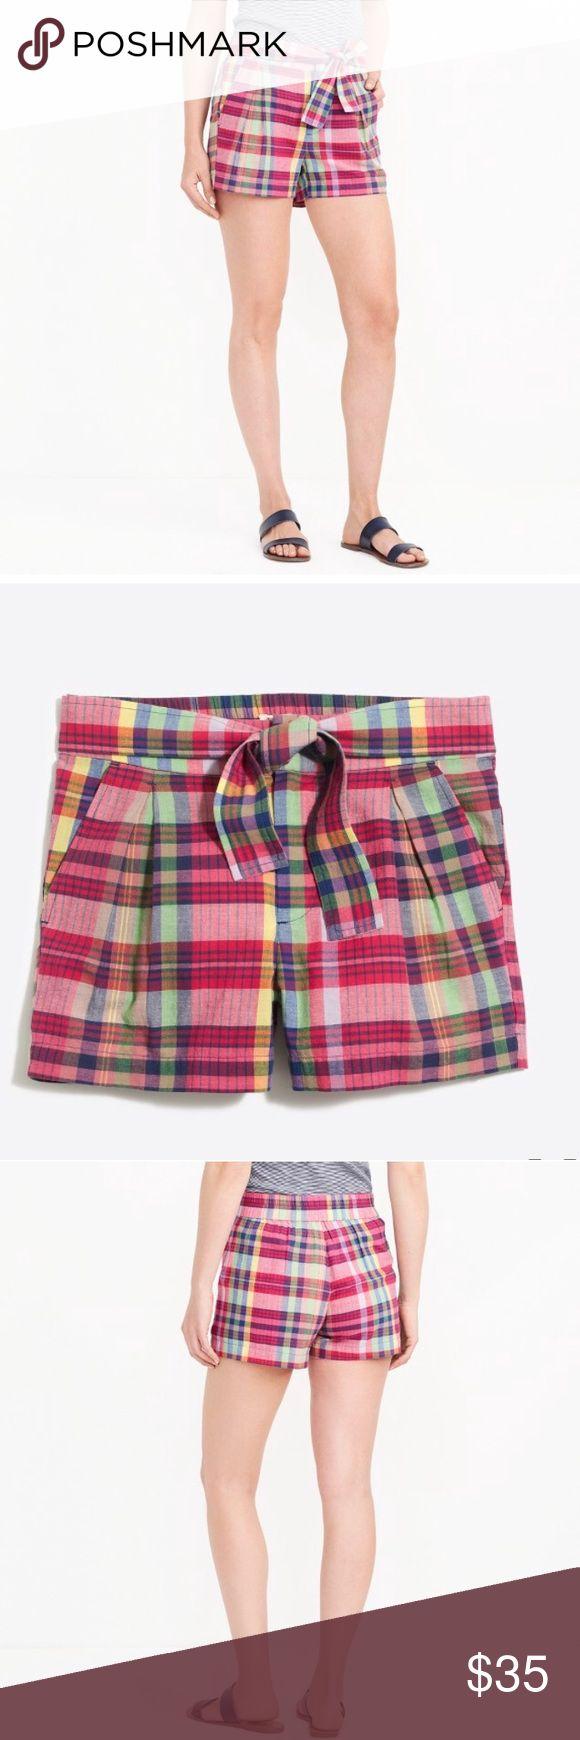 "J.Crew Madras tie-waist 3"" Plaid Shorts J.Crew Madras tie-waist 3"" Plaid Shorts  NWT plus Button Color: pink yellow green •Cotton. •Sits at waist. •3"" inseam. •Zip fly. •Slant pockets. •Machine wash. •Import. •ItemG6335. Retail $49.50  Size 6 - Run large, please see measurements  Waist 15.5"" Hips 20.5""  *Measurements taken laying flat J. Crew Shorts"